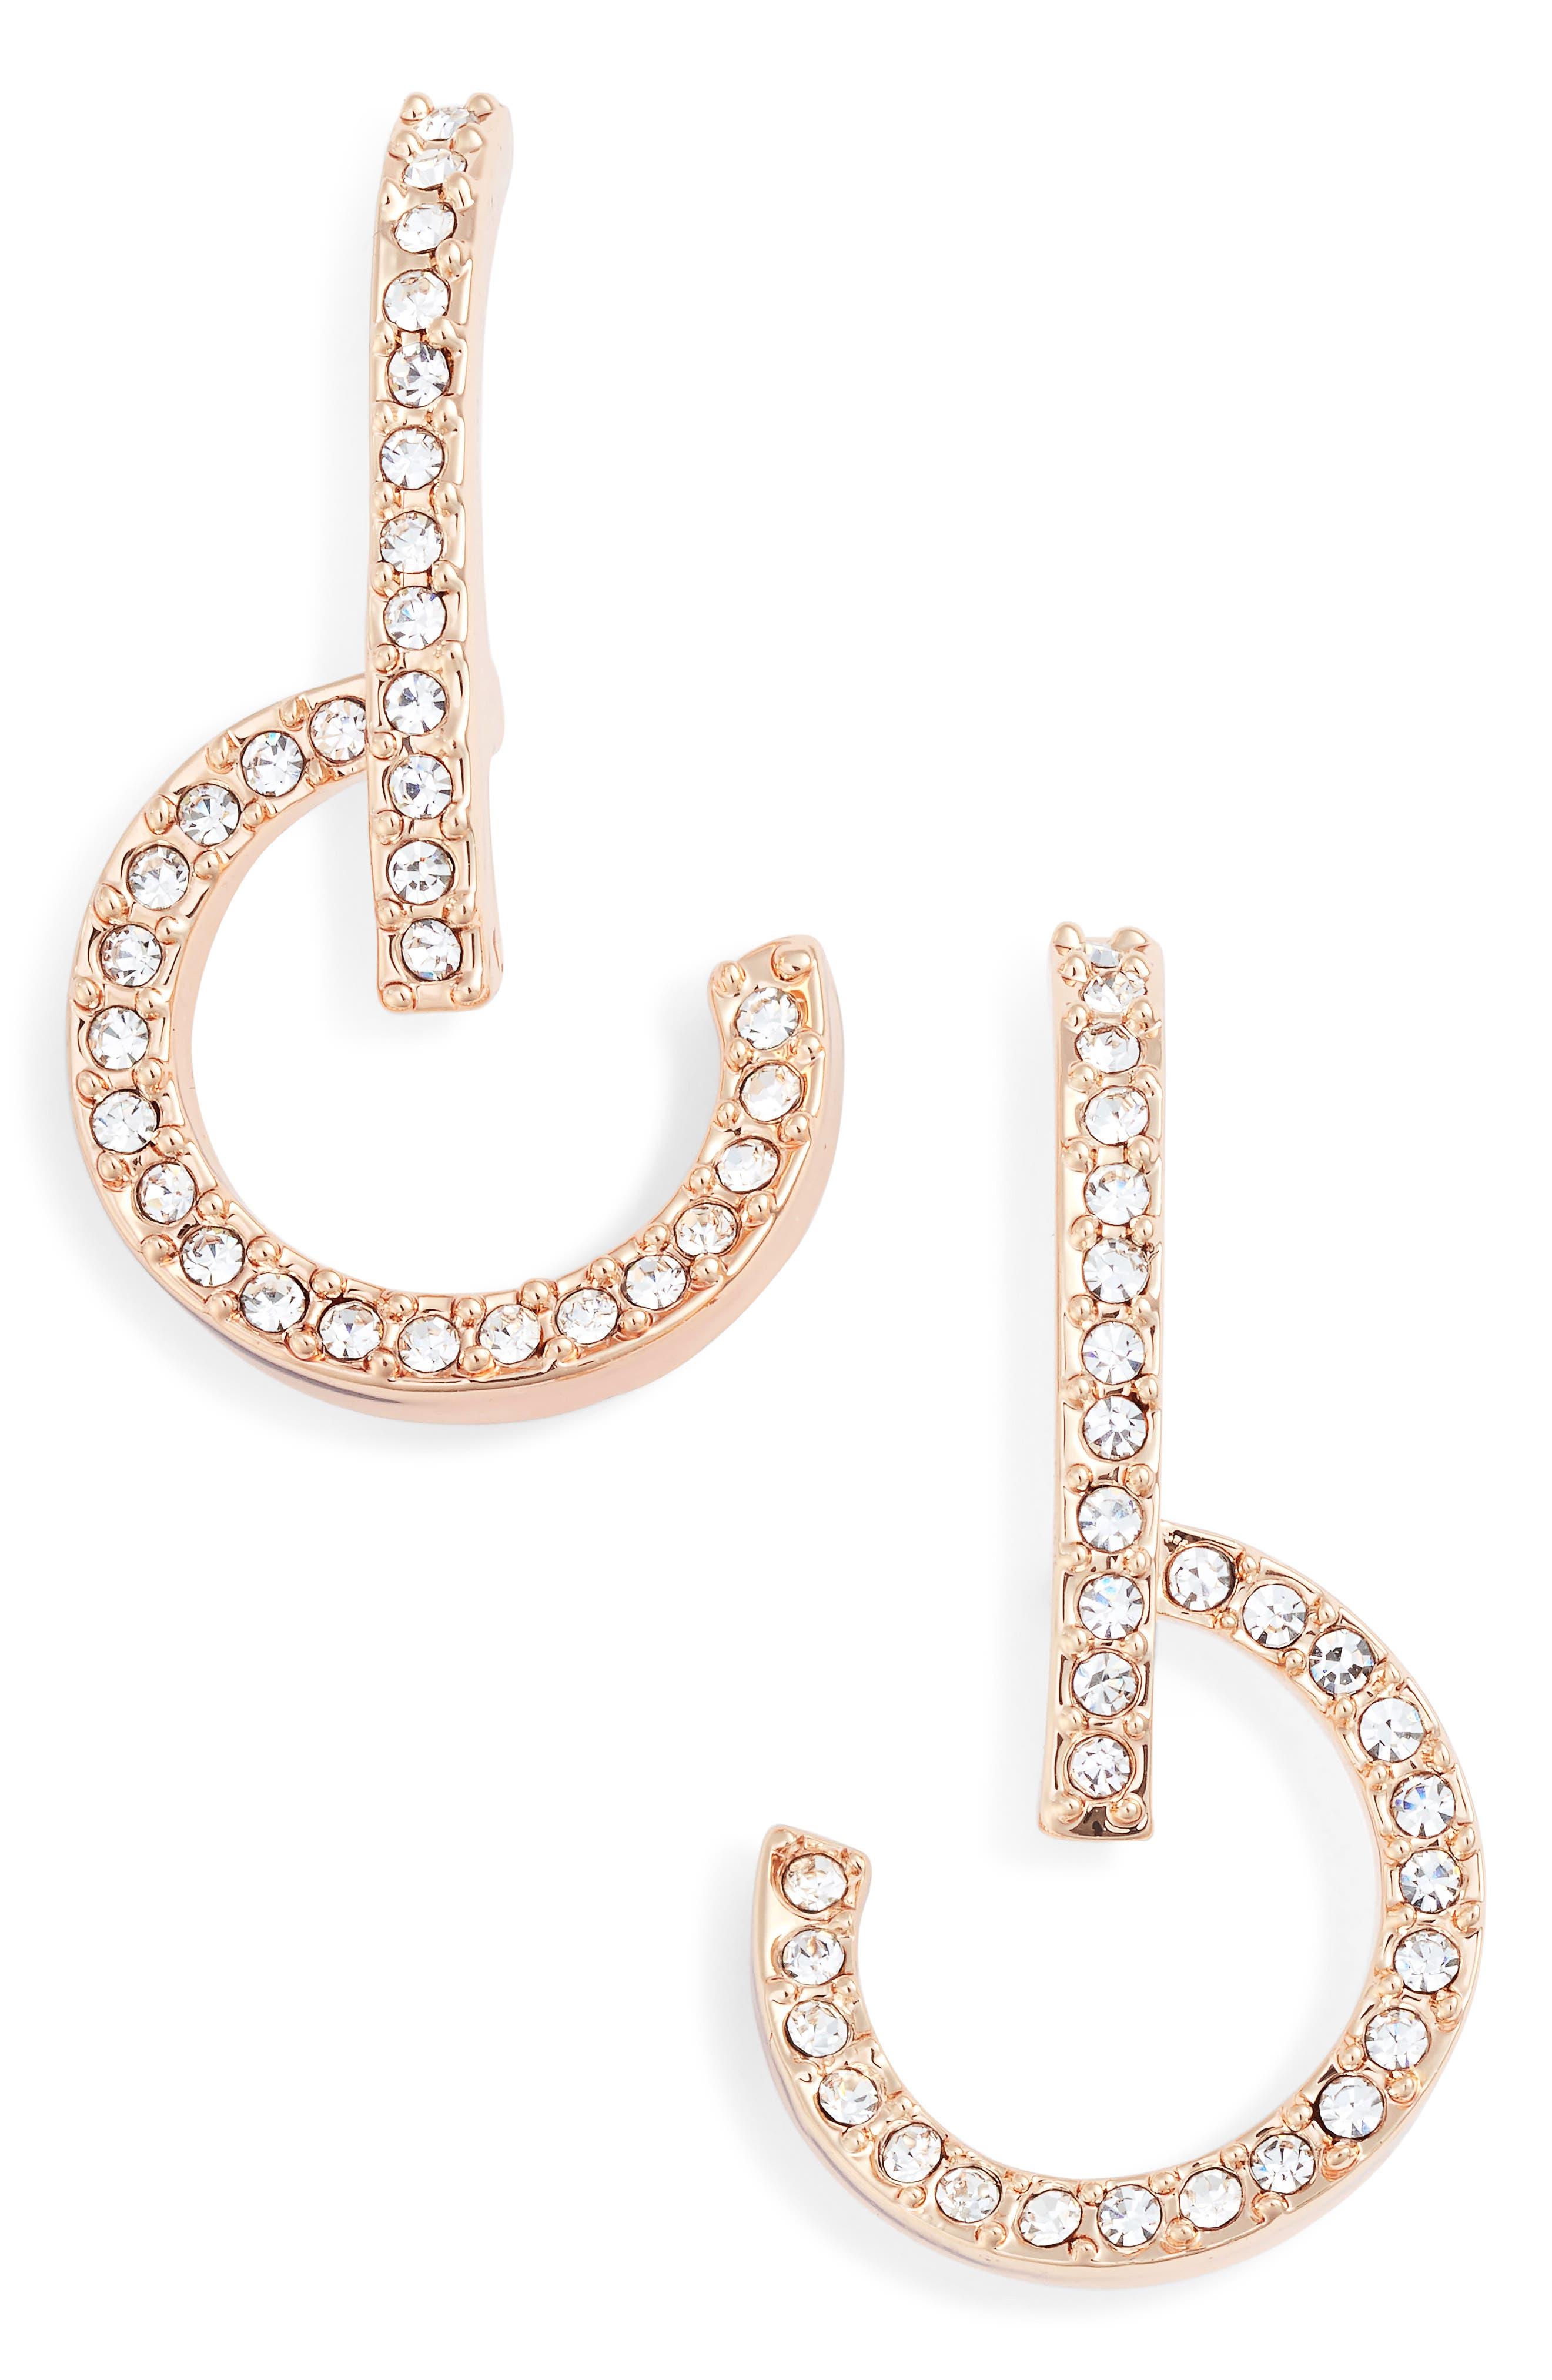 Lobe and Hoop Earrings,                             Main thumbnail 1, color,                             Rose Gold